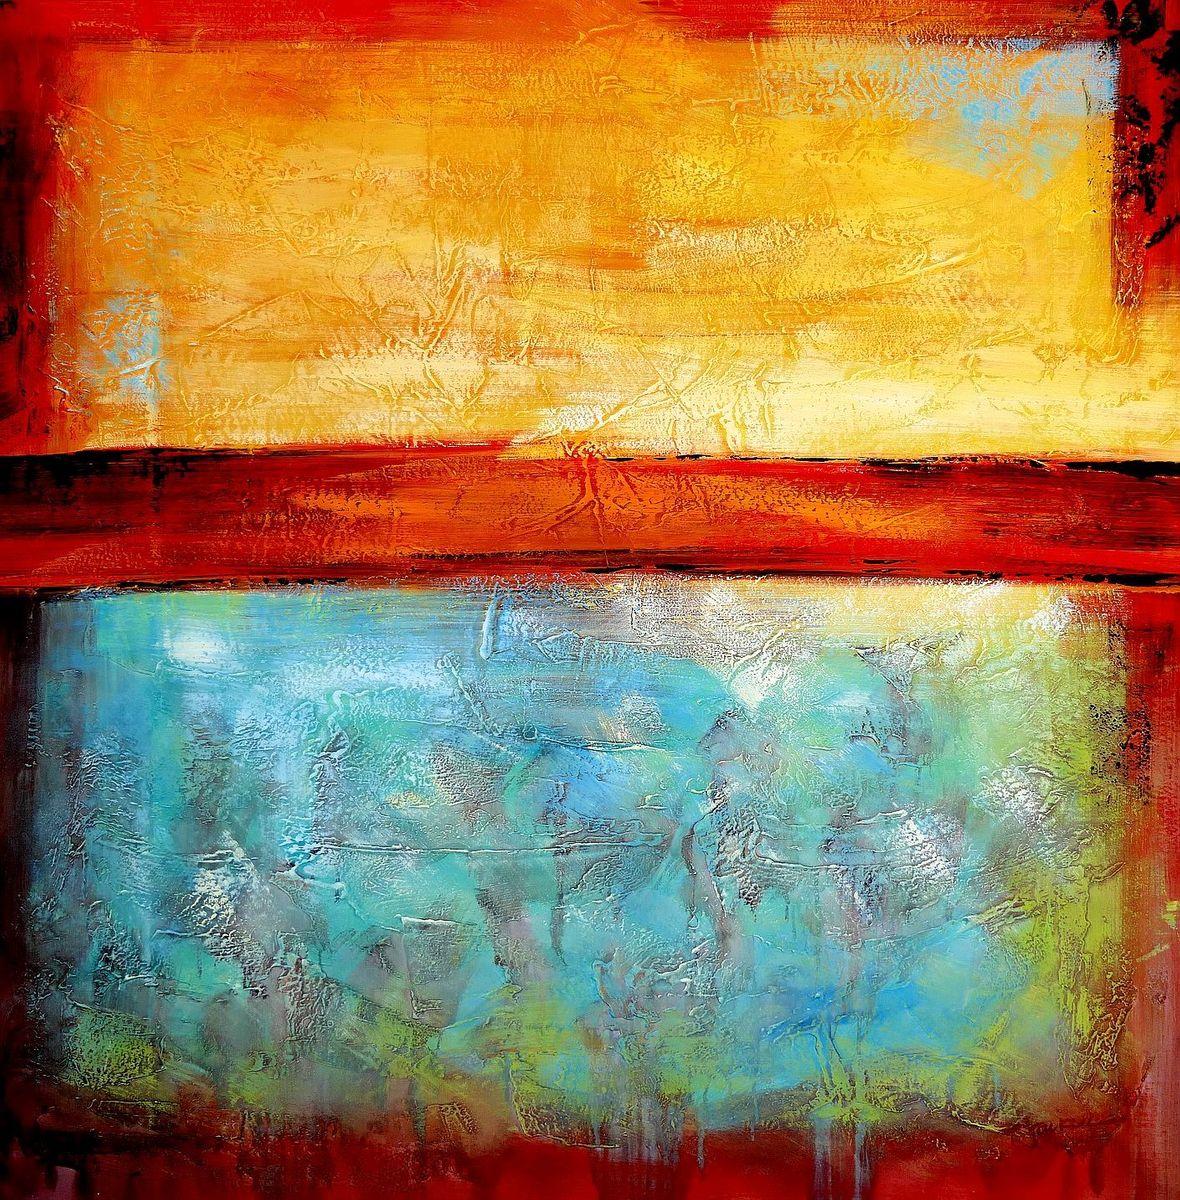 Abstract - Mirage in Babylon m98002 120x120cm abstraktes Ölbild